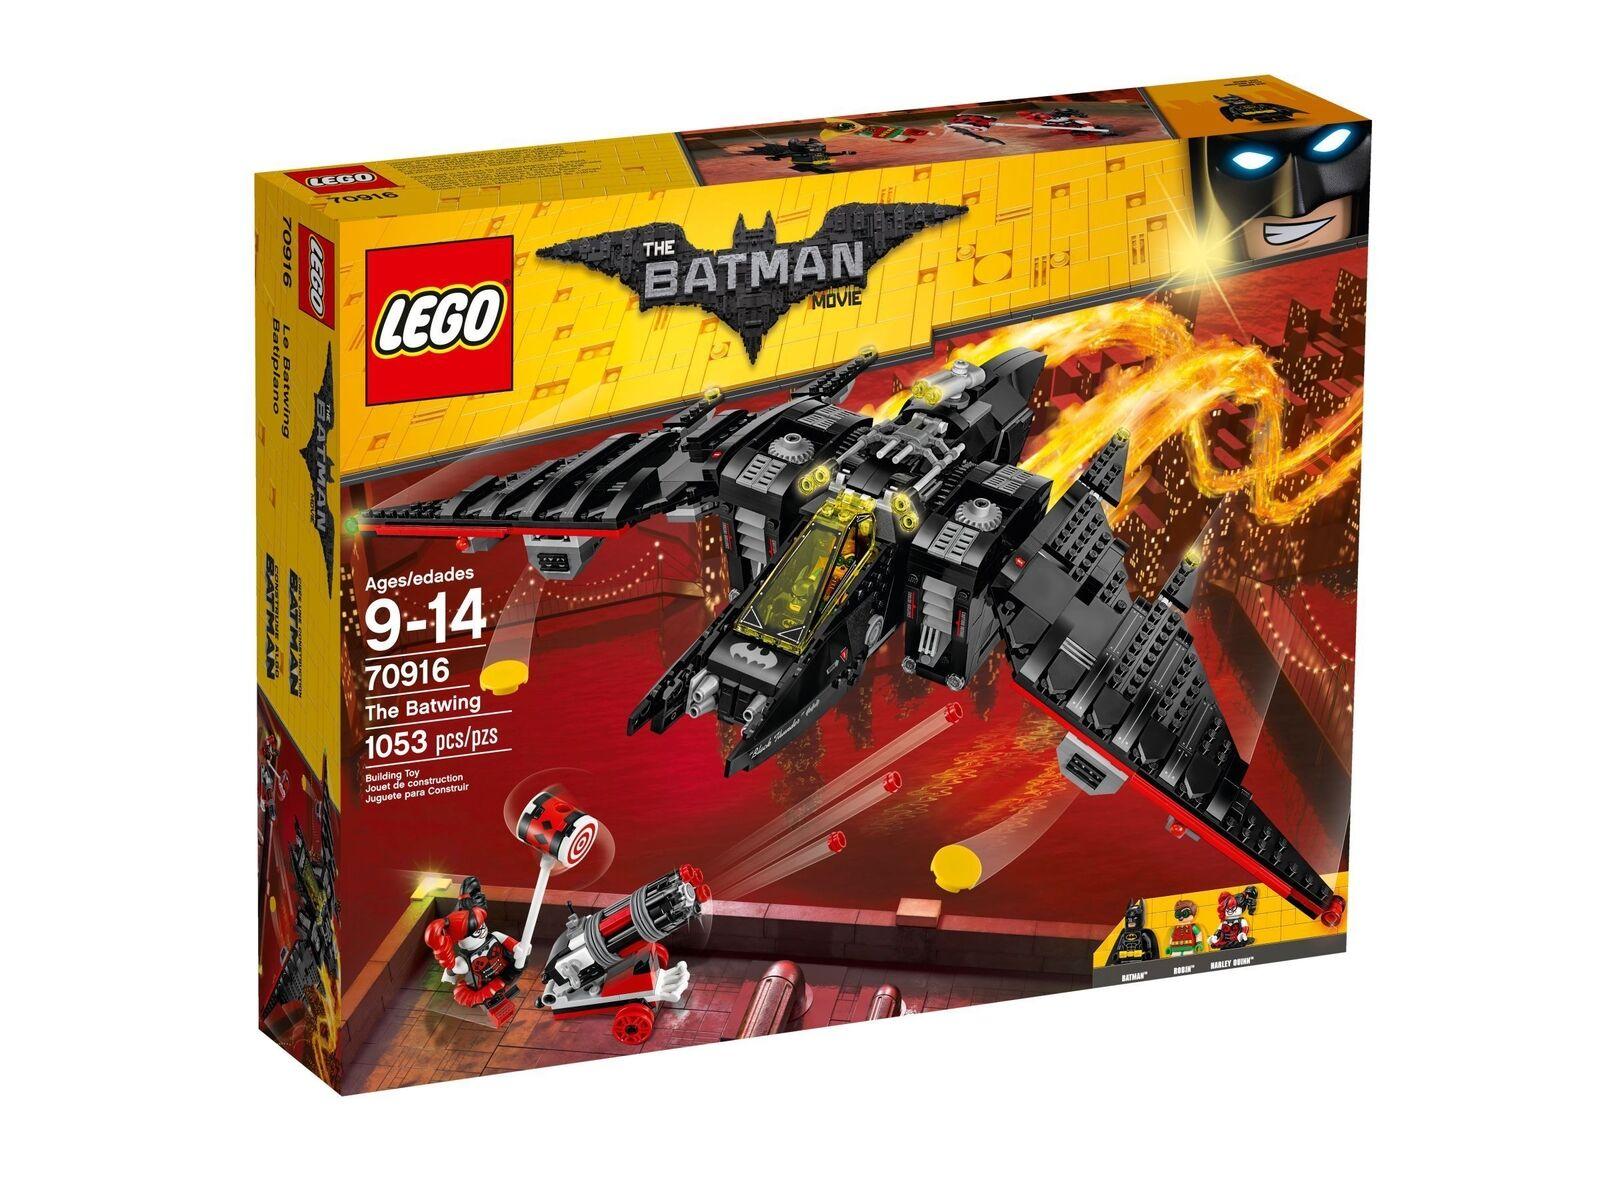 The Lego Batman Película 70916 Batwing Nuevo Embalaje Original Misb